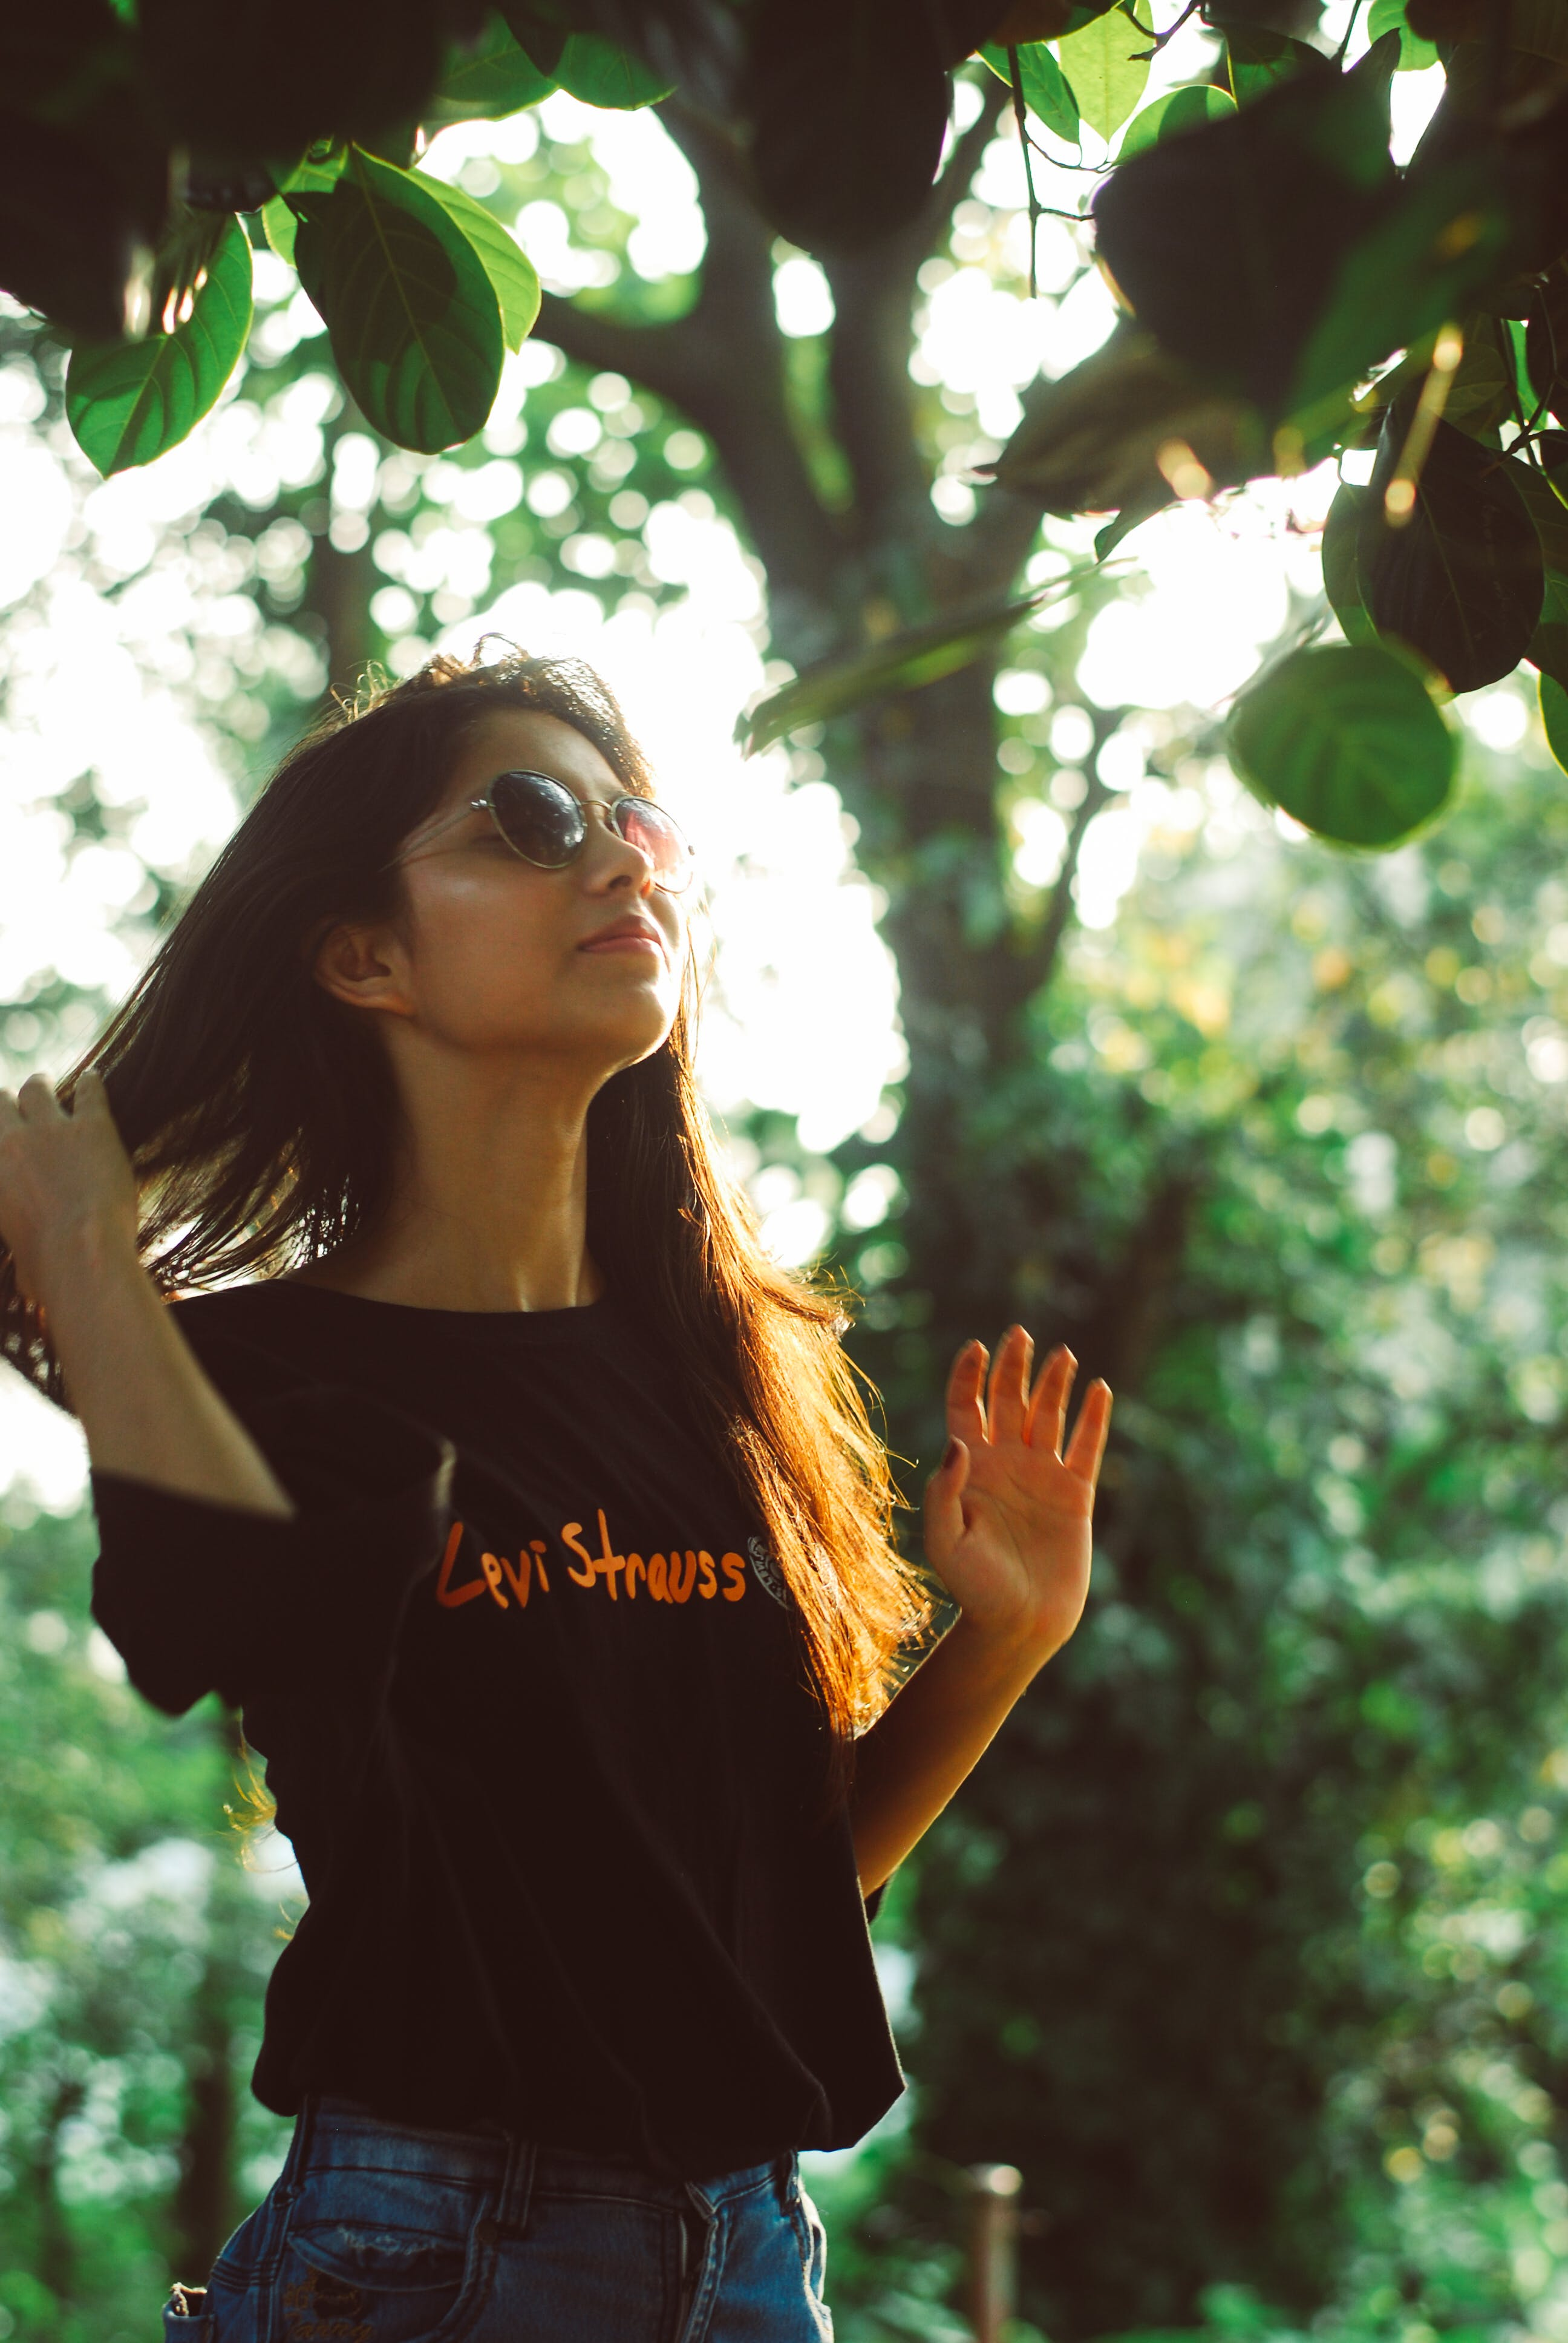 Free stock photo of beautiful girl, golden hour, nature